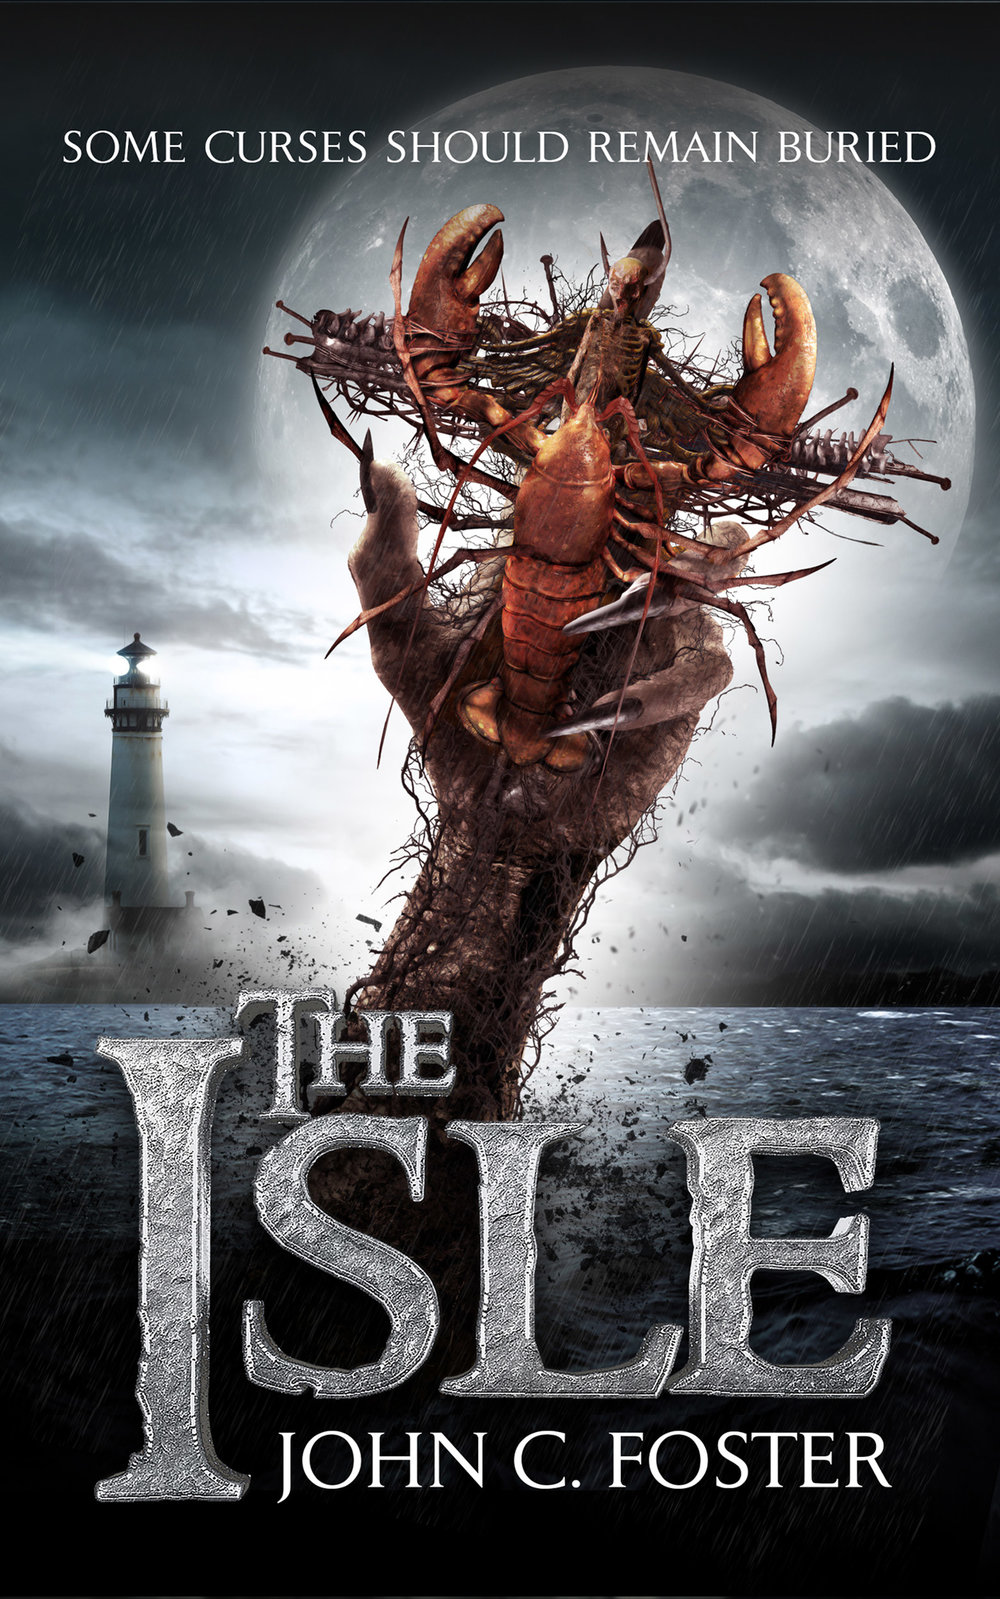 The Isle_John C Foster.jpg